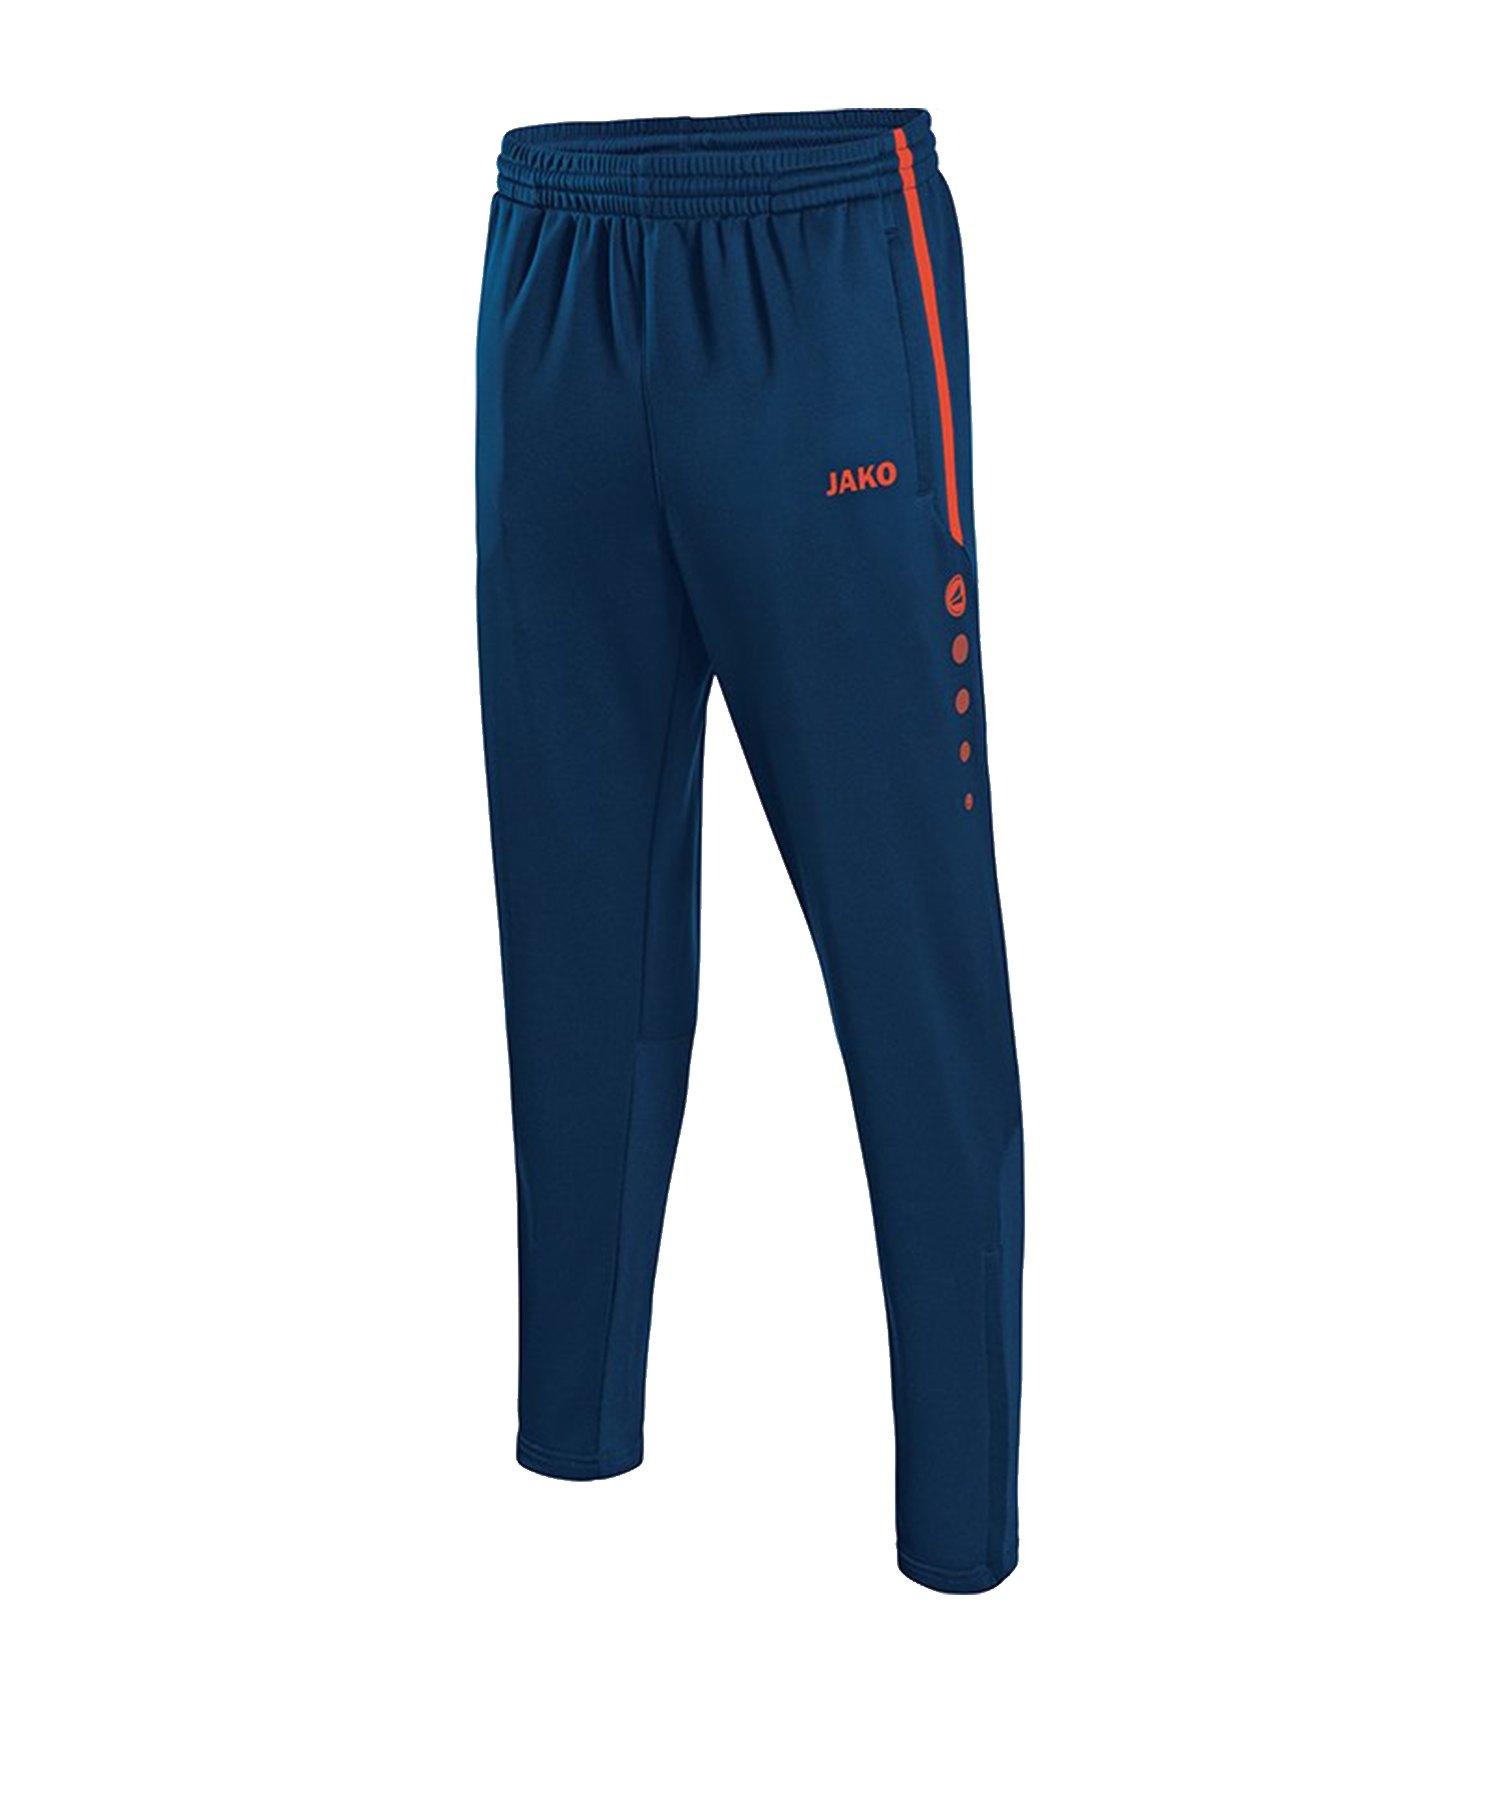 Jako Active Trainingshose Kids Blau Orange F18 - Blau